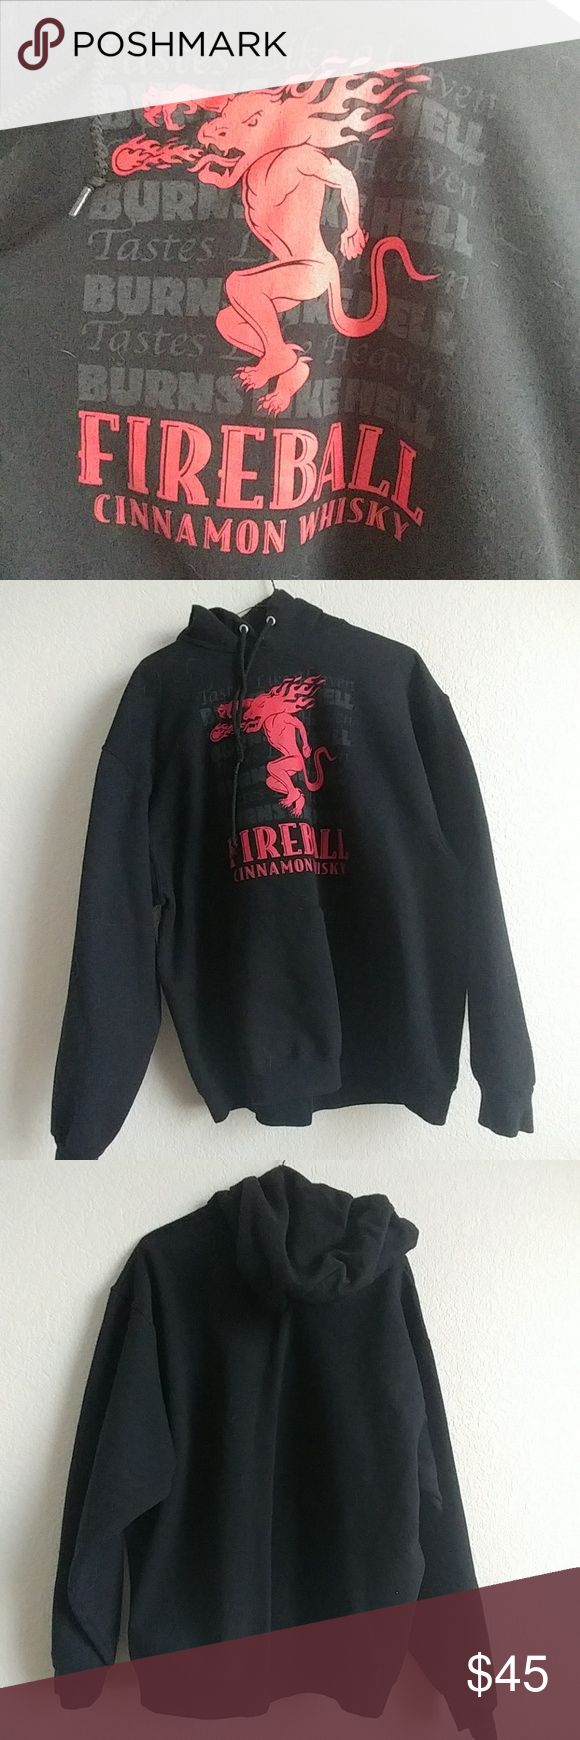 Men's Fireball whiskey hoodie Like new Other